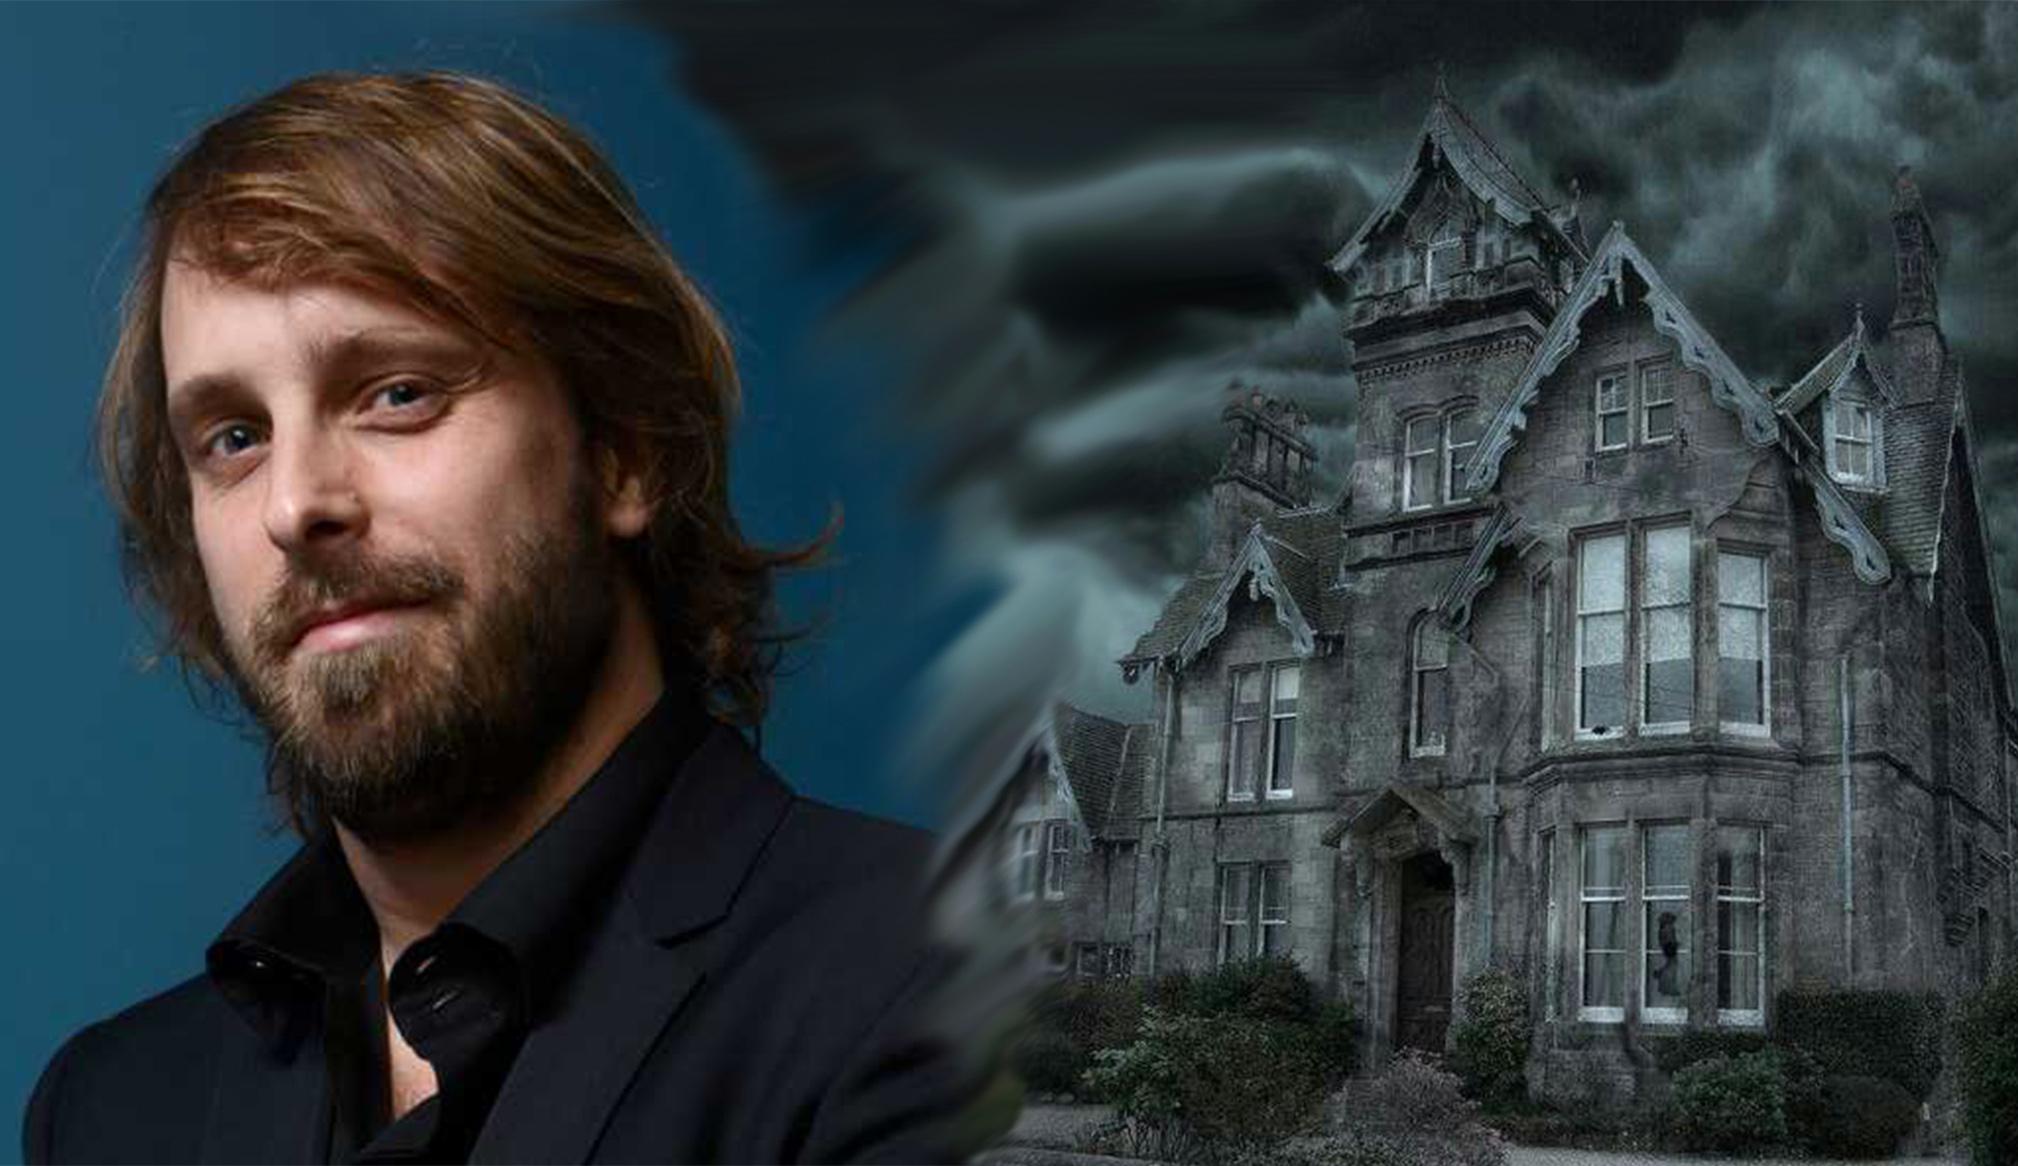 Alexandre Aja dirigirá película de terror interactiva sobre casa embrujada